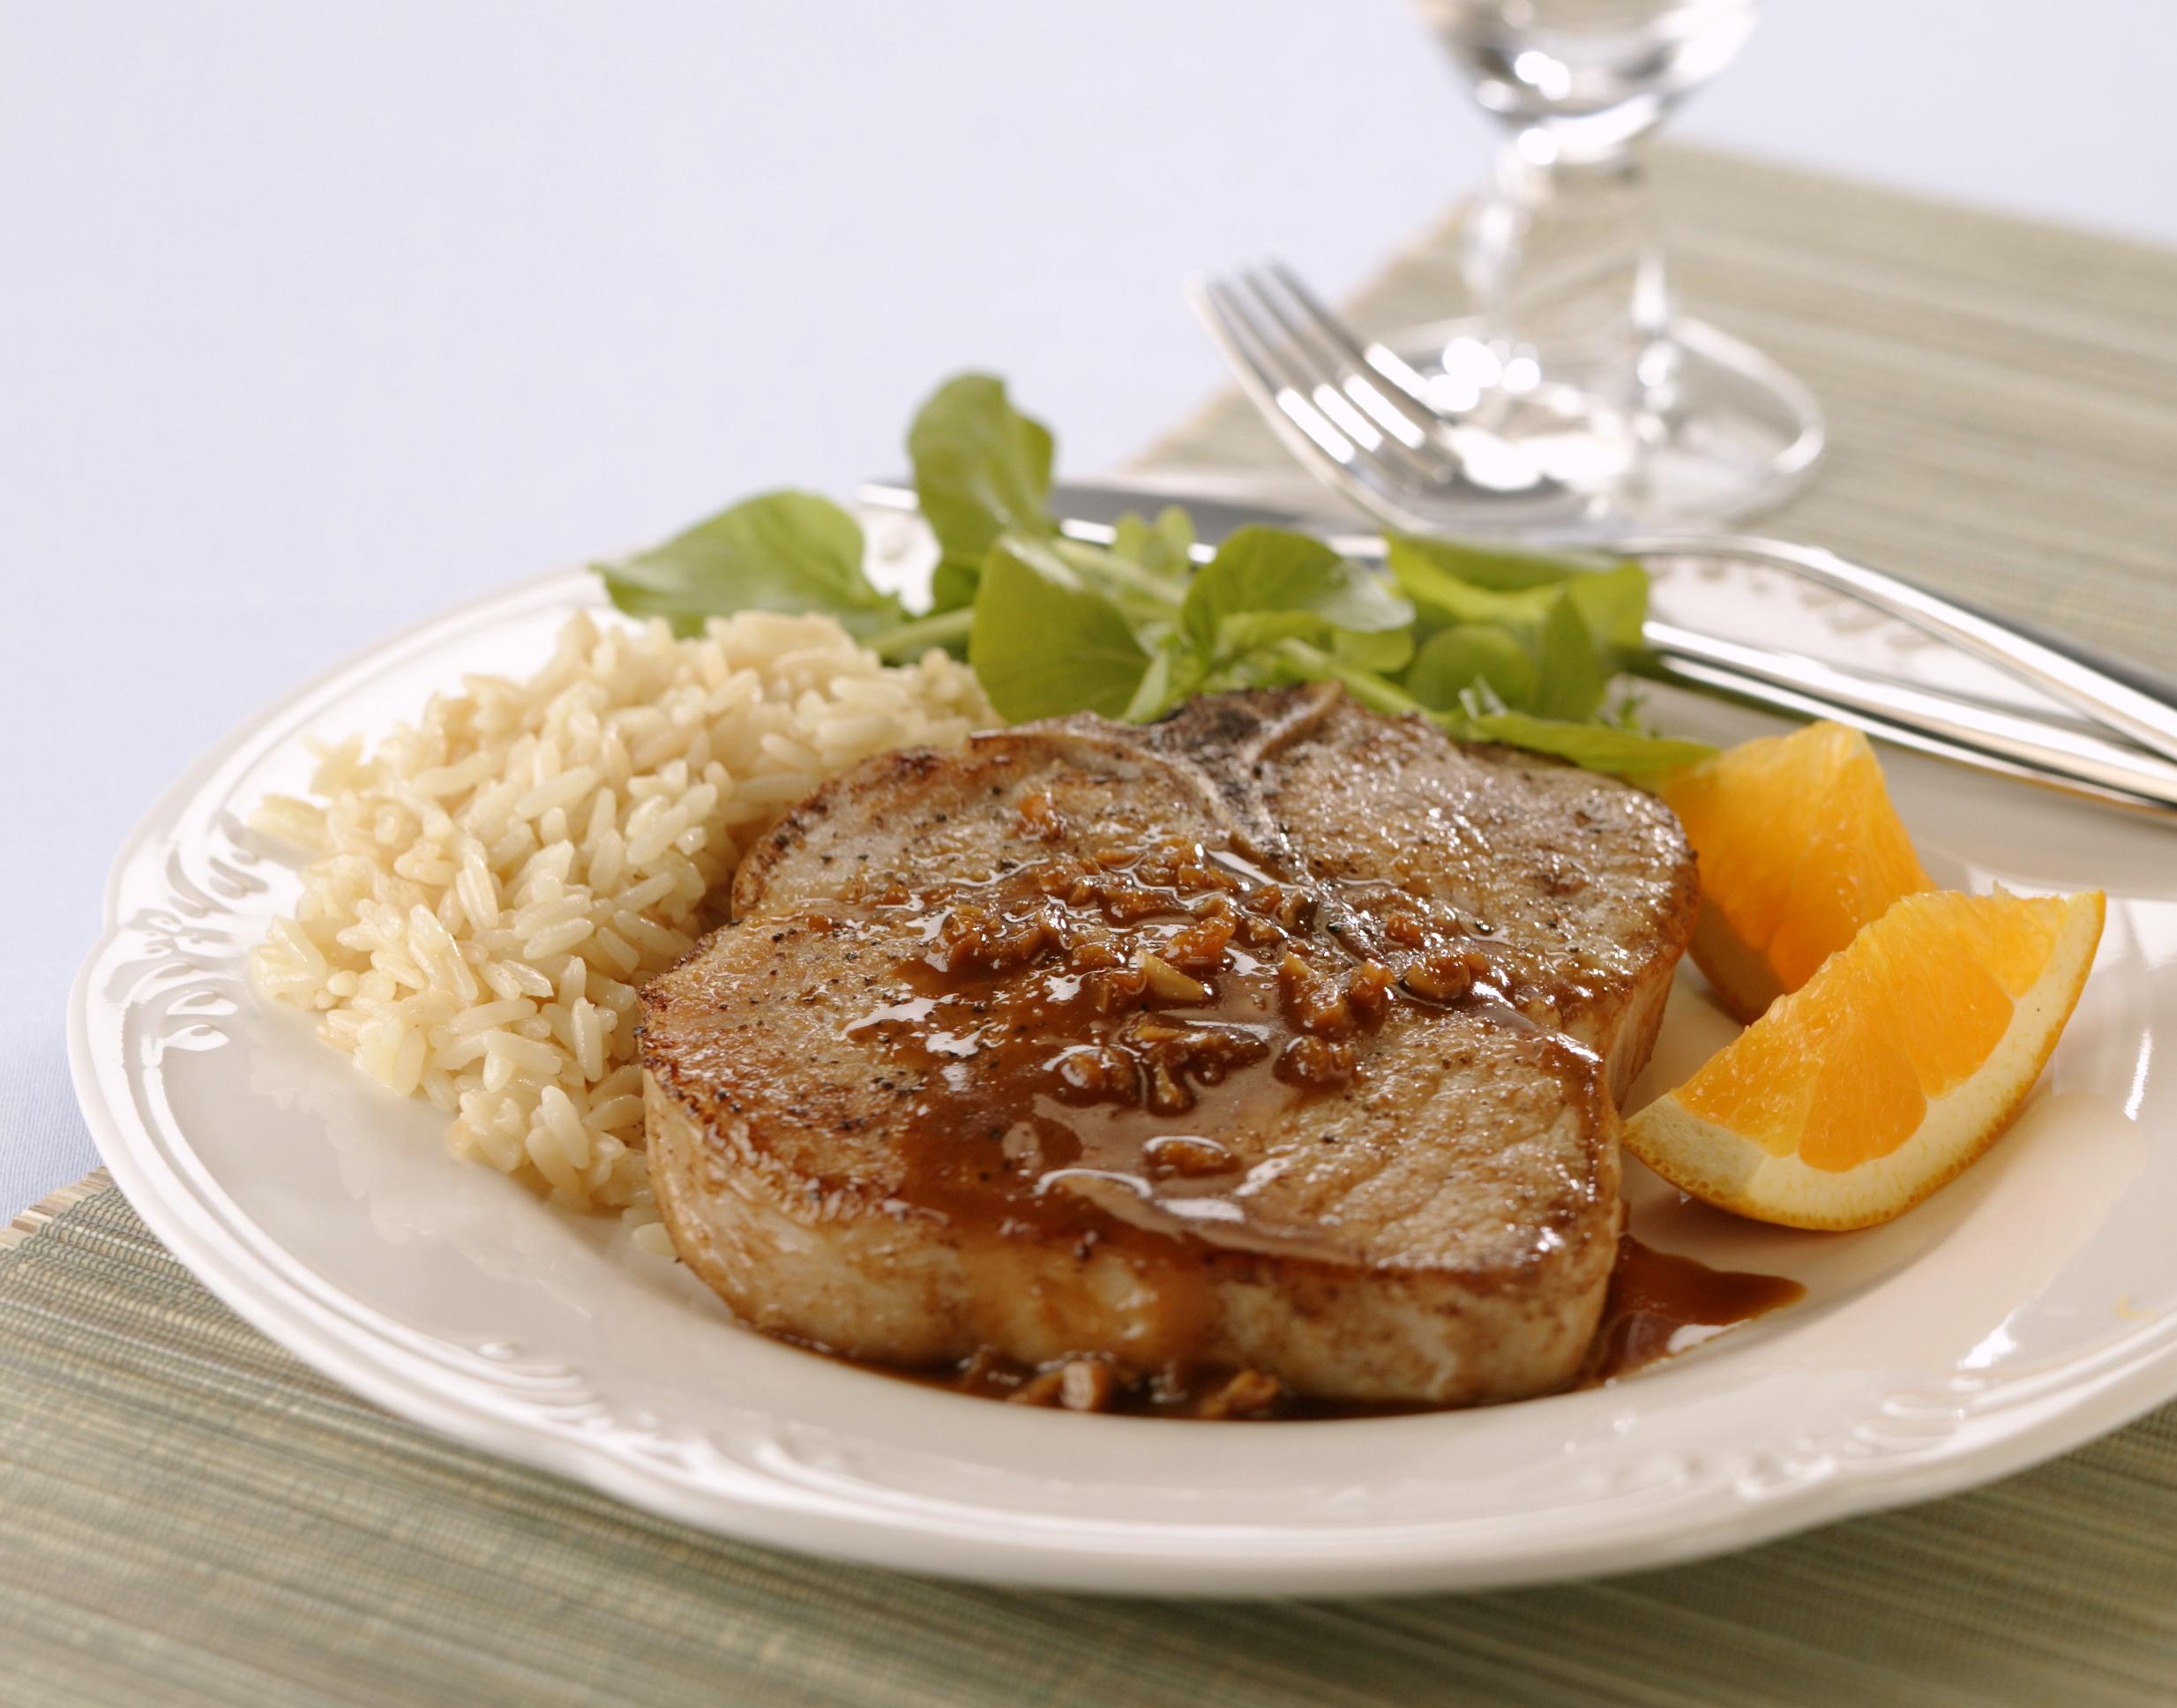 Braised Pork Chops with Orange-Mustard Sauce - Pork Recipes - Pork Be ...